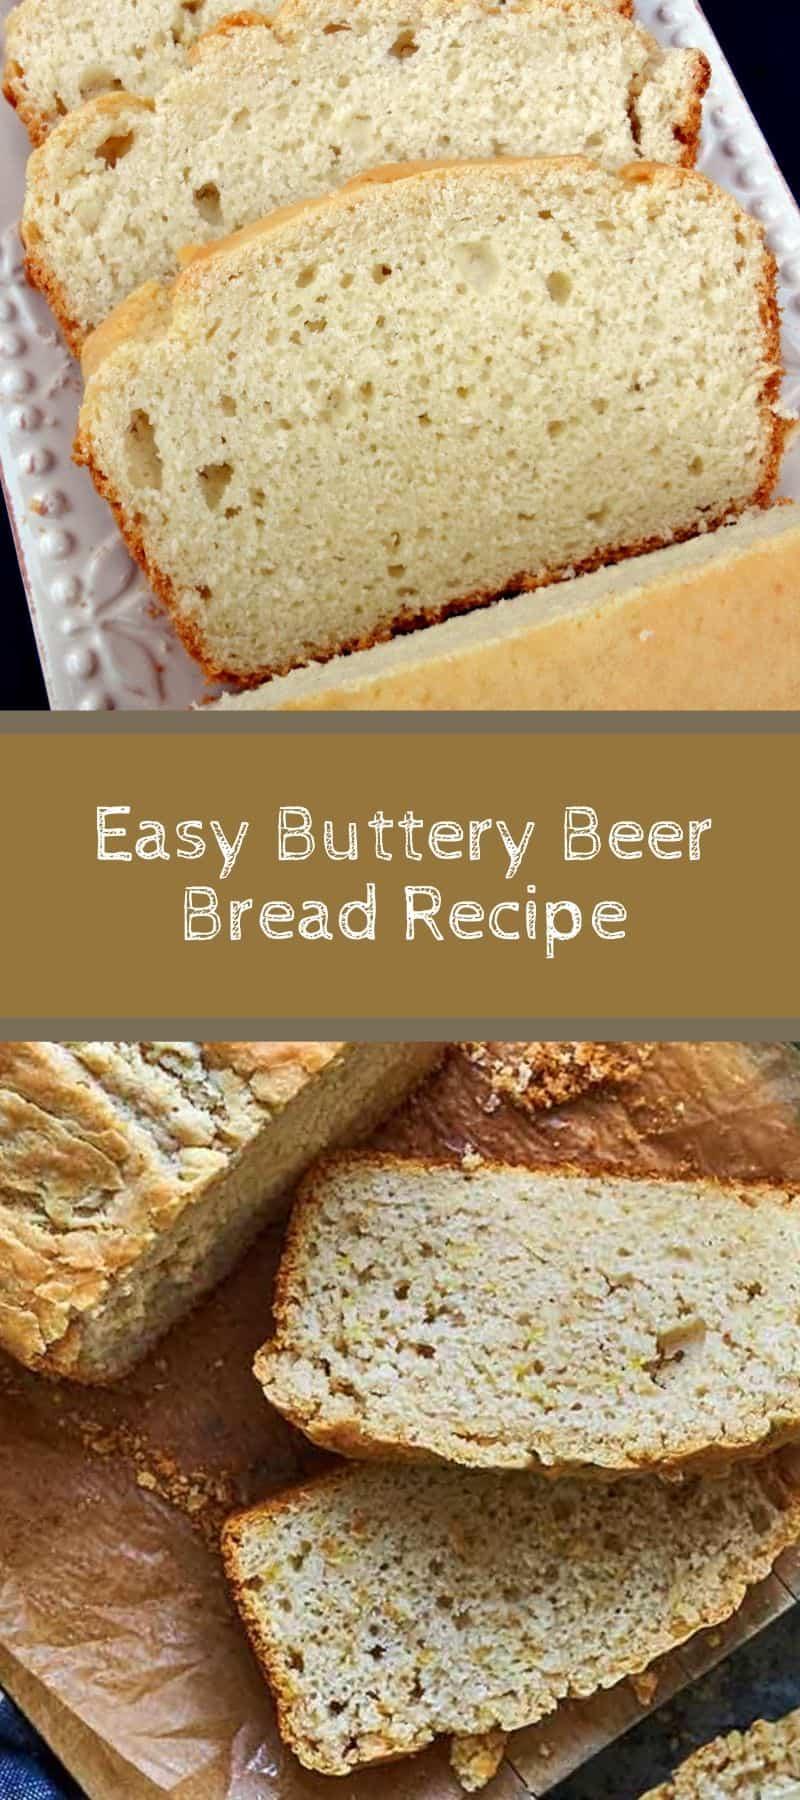 Easy Buttery Beer Bread Recipe - Grandma Linda's Recipes